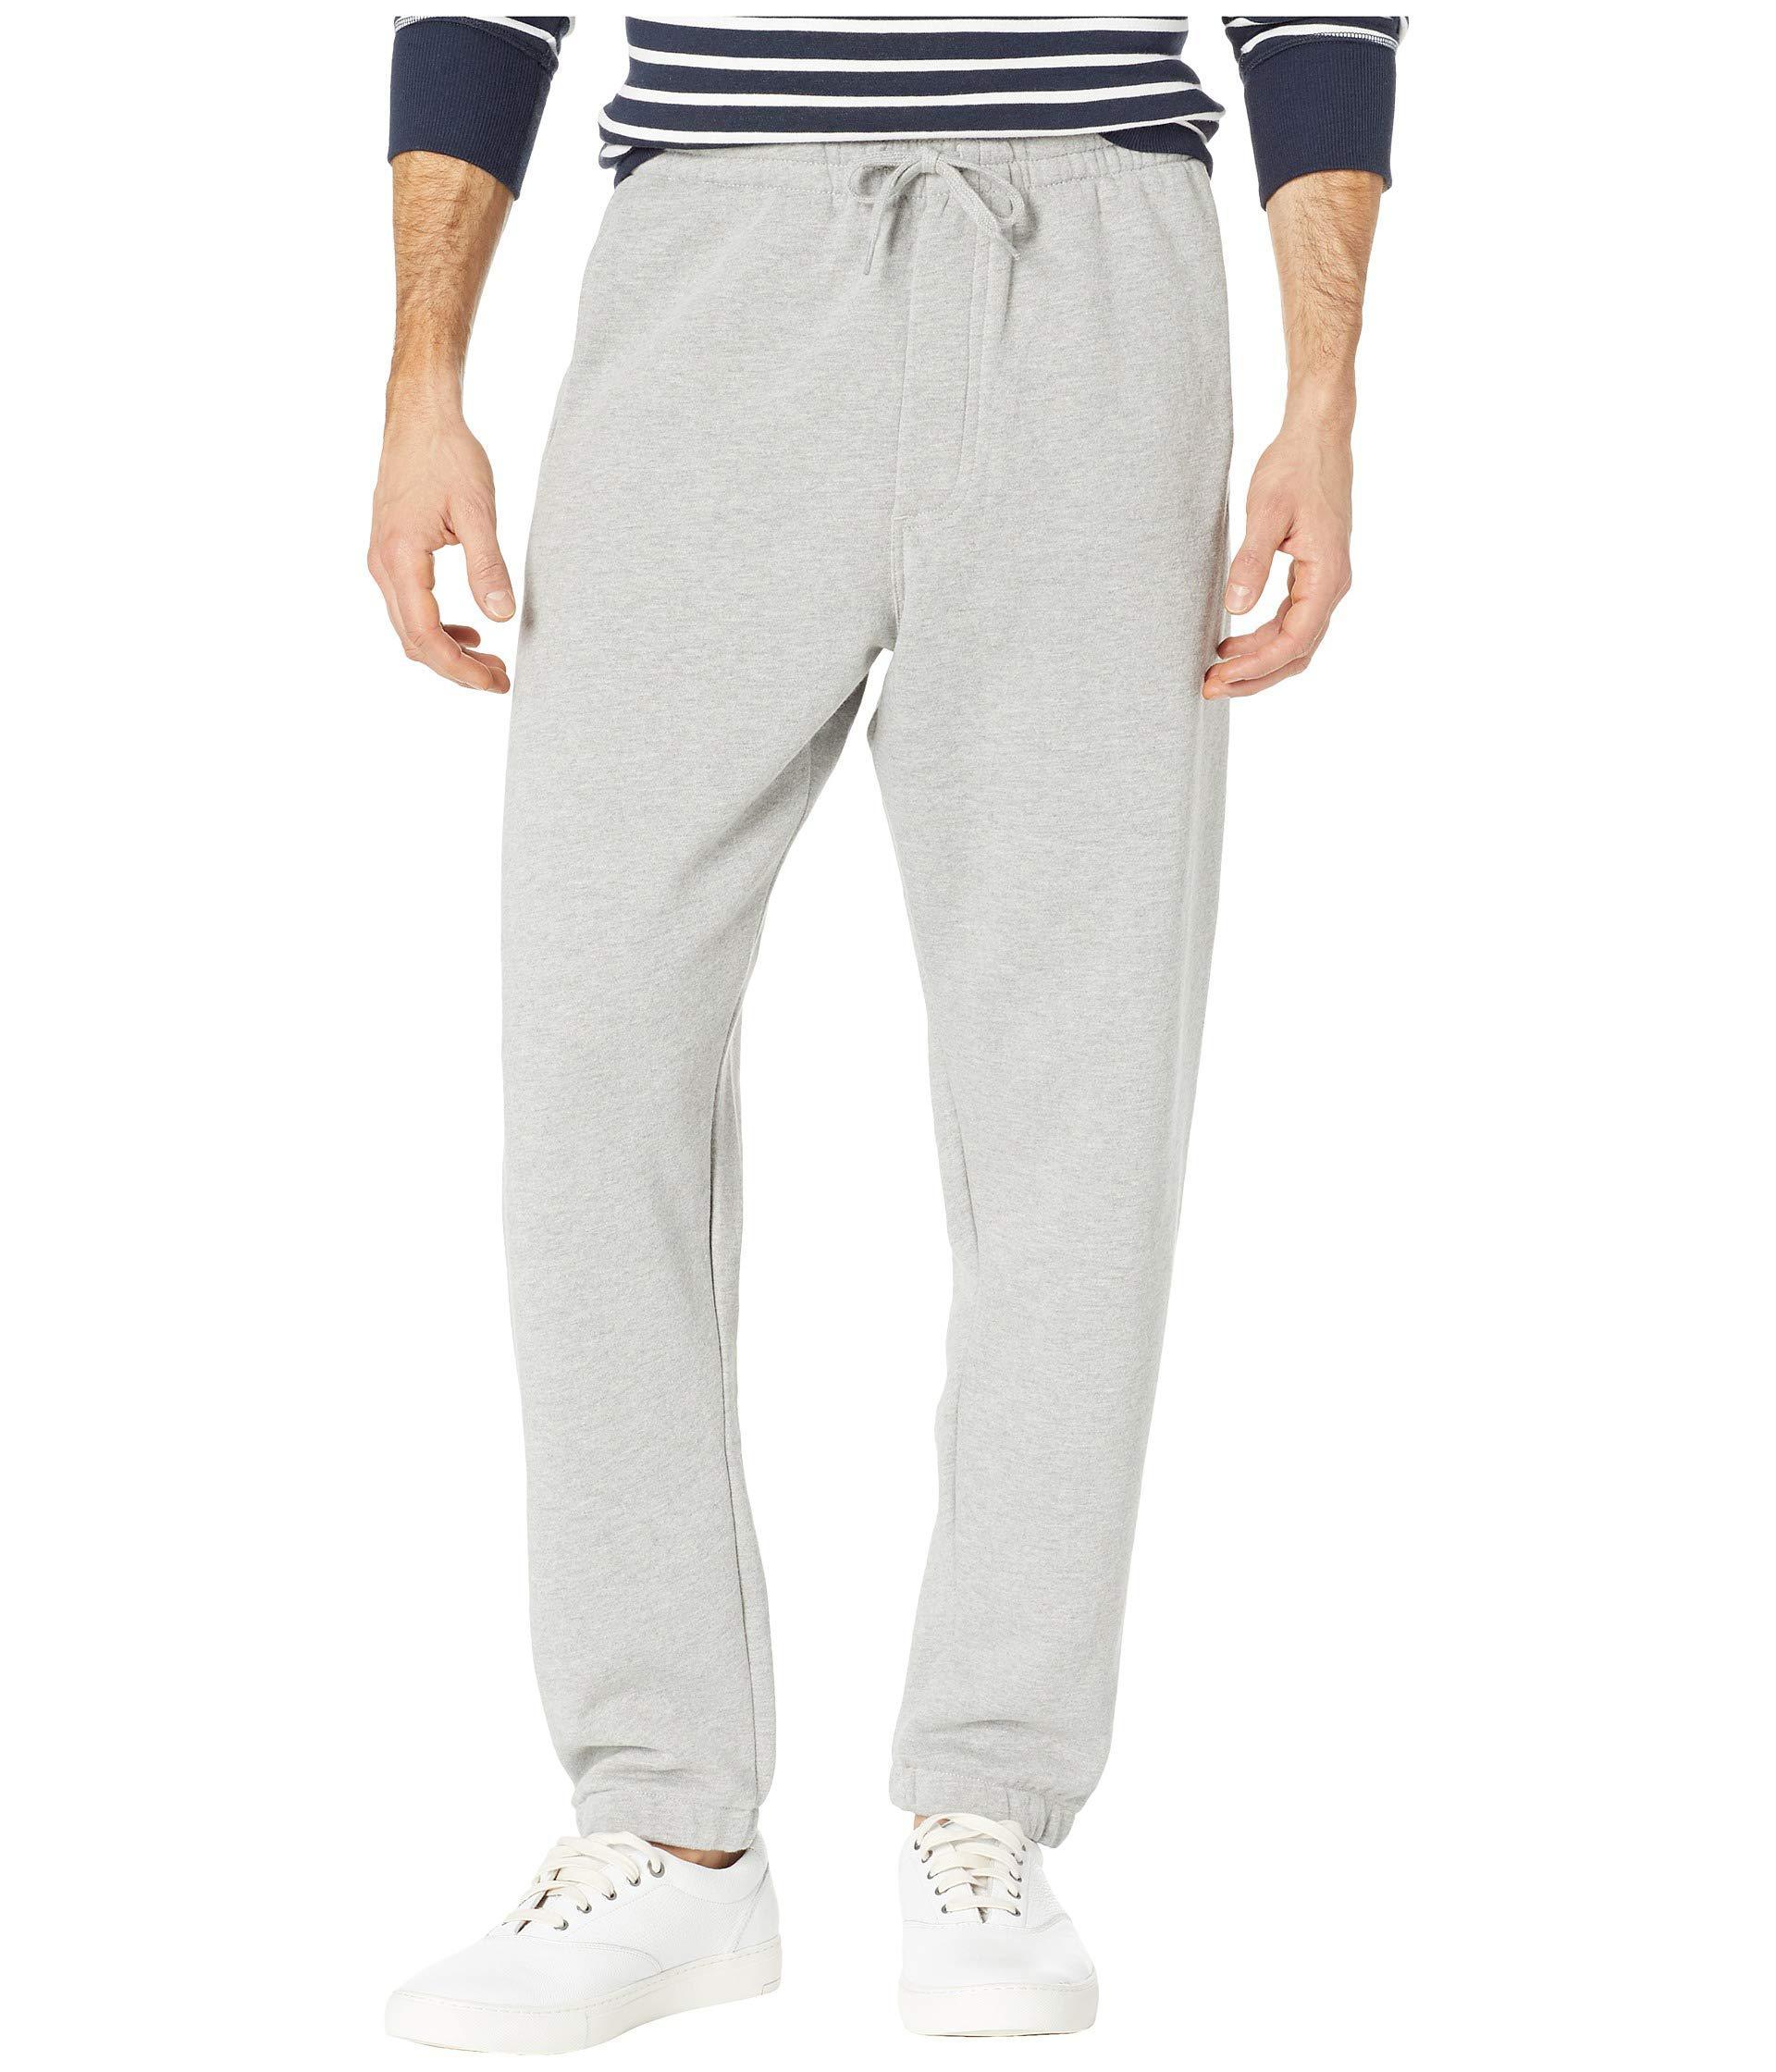 2301f7f69cc Lyst - Vans Basic Fleece Pants (cement Heather) Men s Casual Pants ...